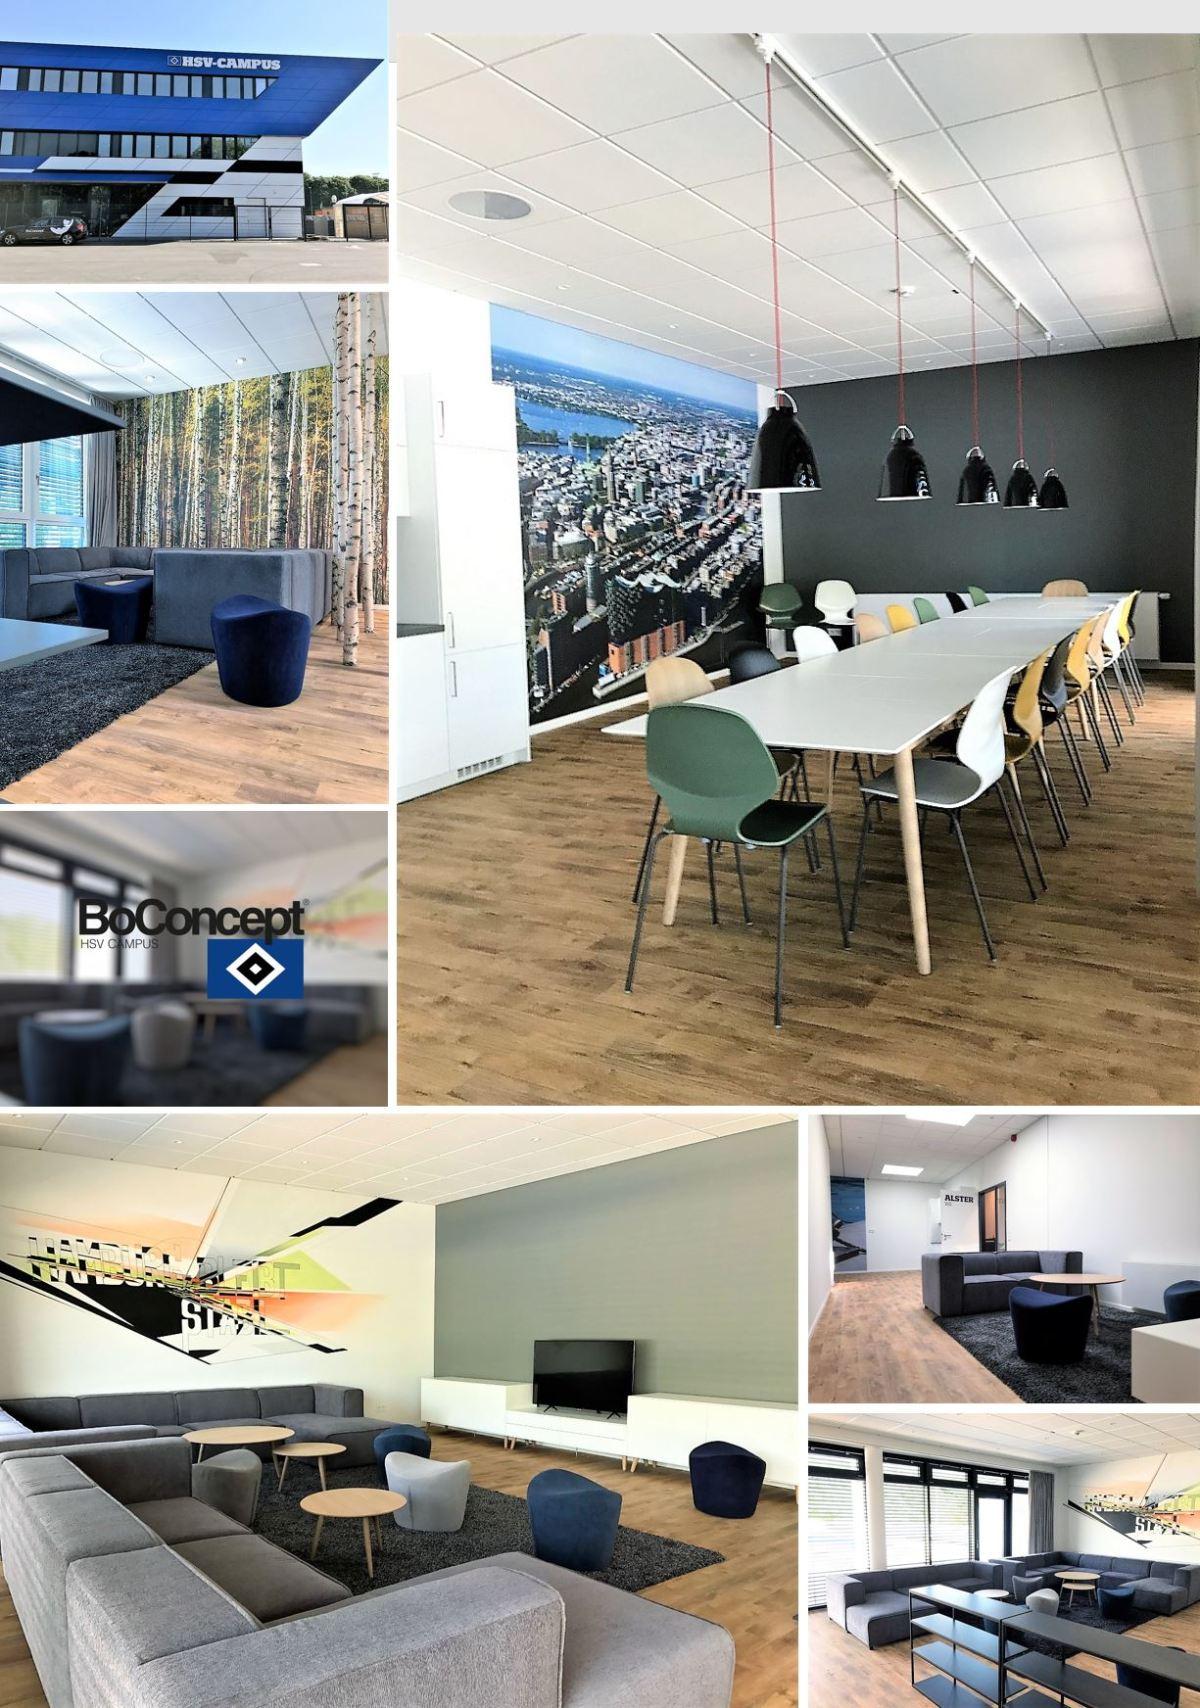 BoConcept Experience, BoConcept, Design, HSV, Campus